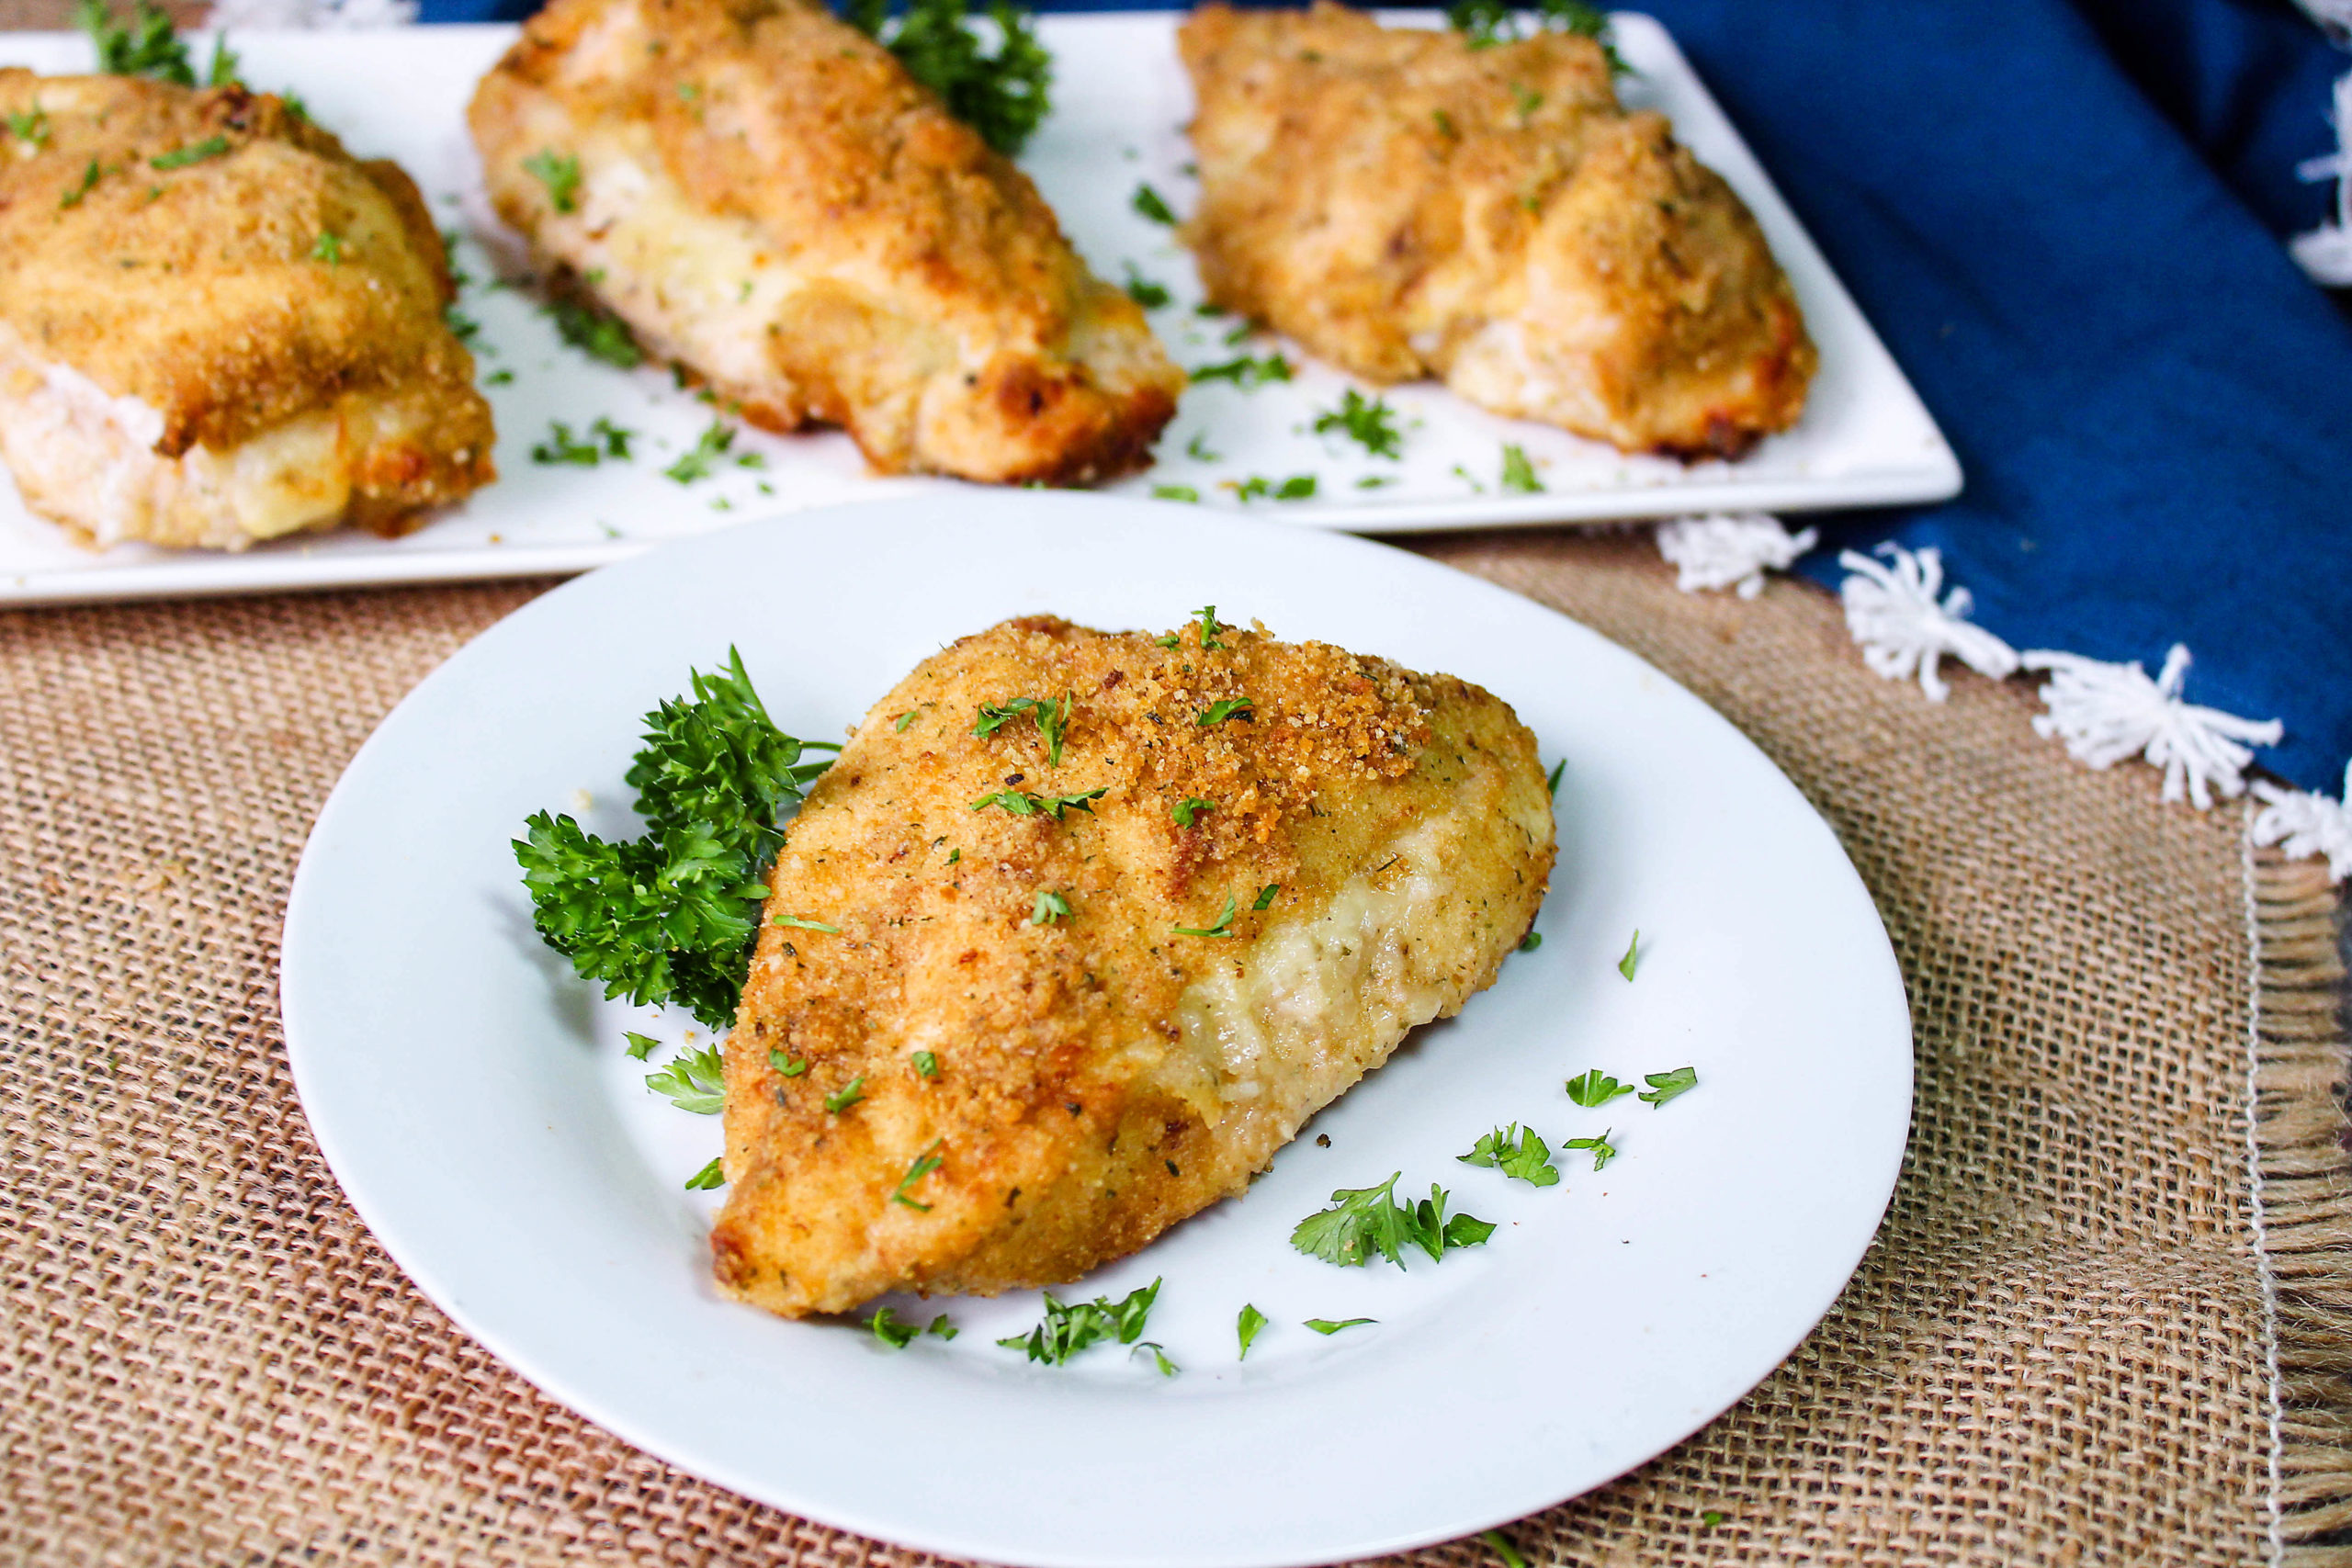 Cheesy Garlic Stuffed Chicken